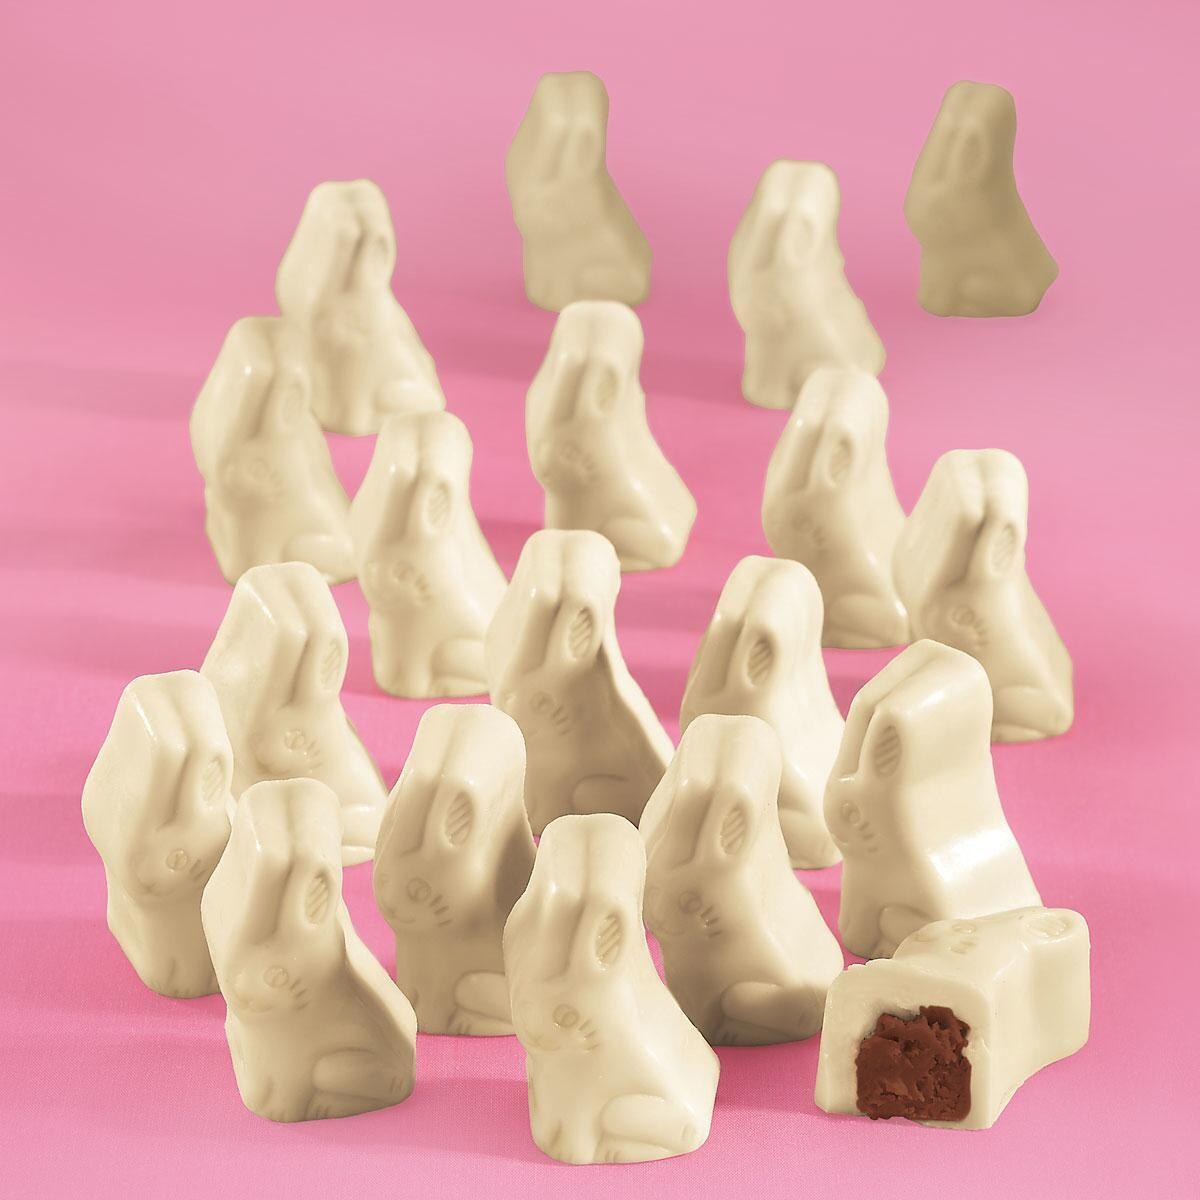 White Chocolate Bunnies